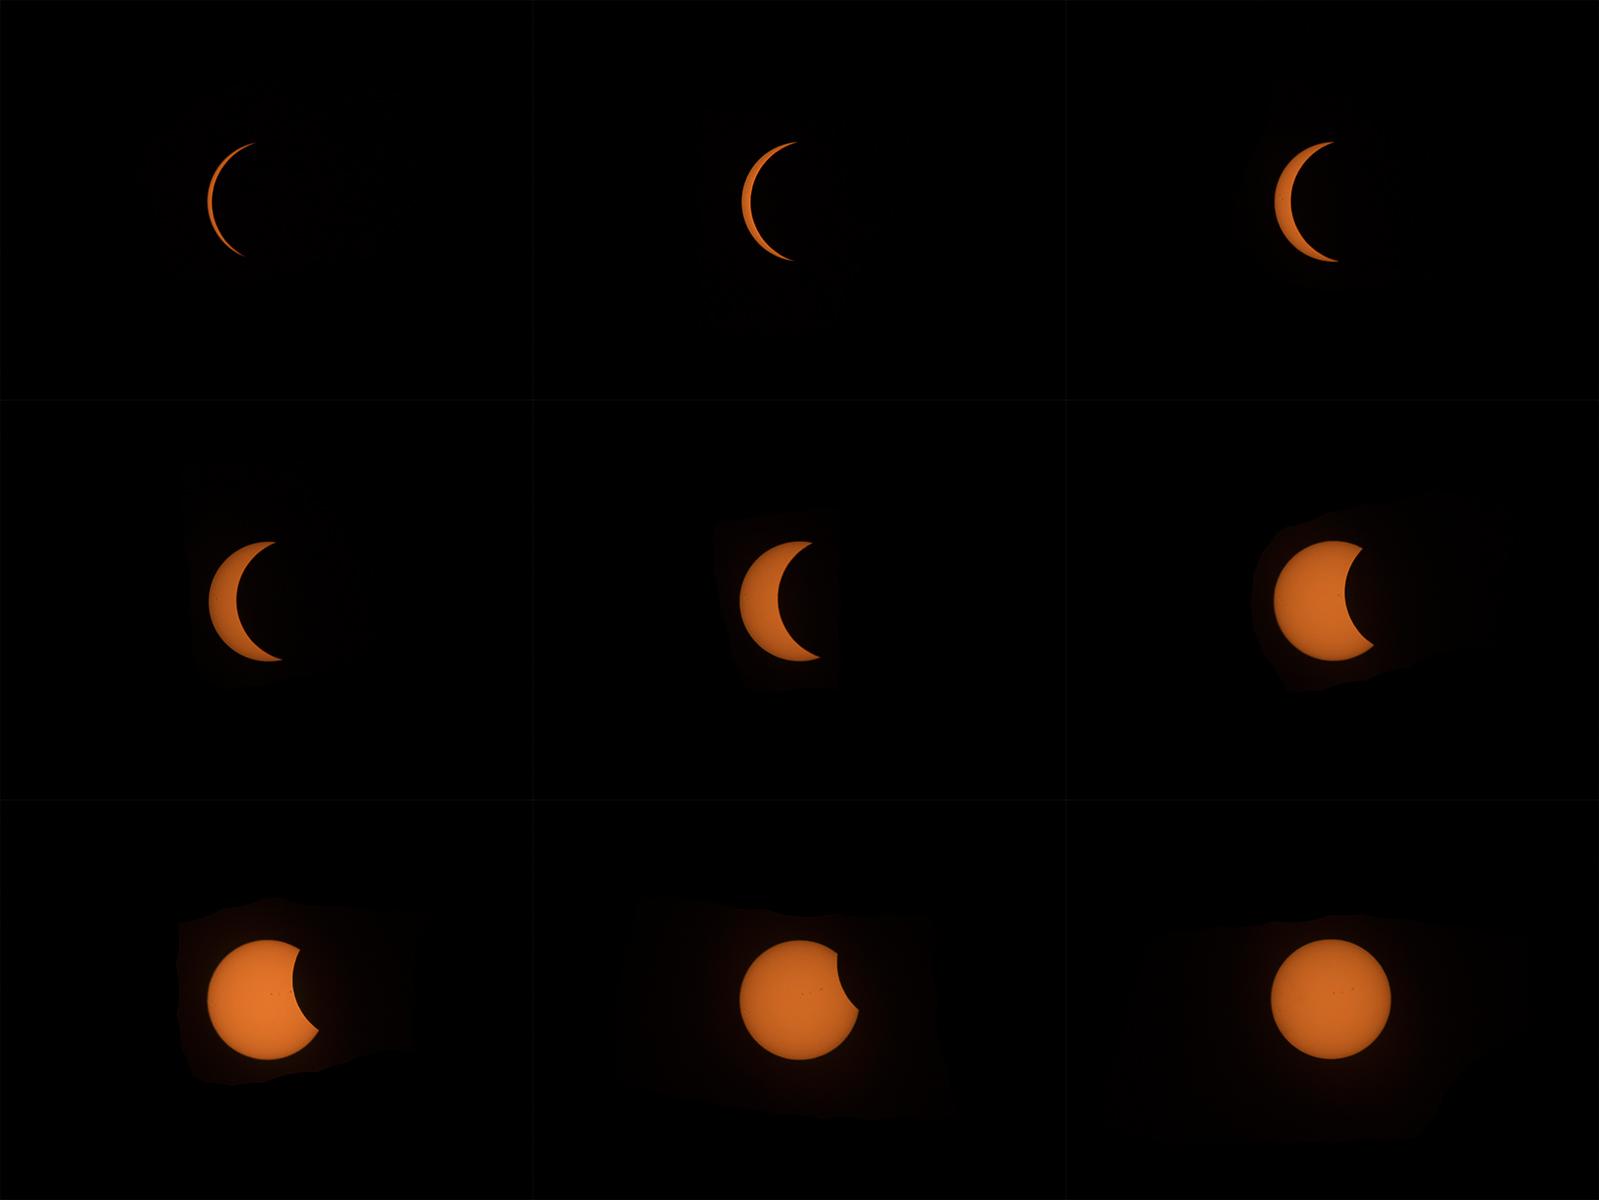 SolarEclipse_20170826_003.jpg